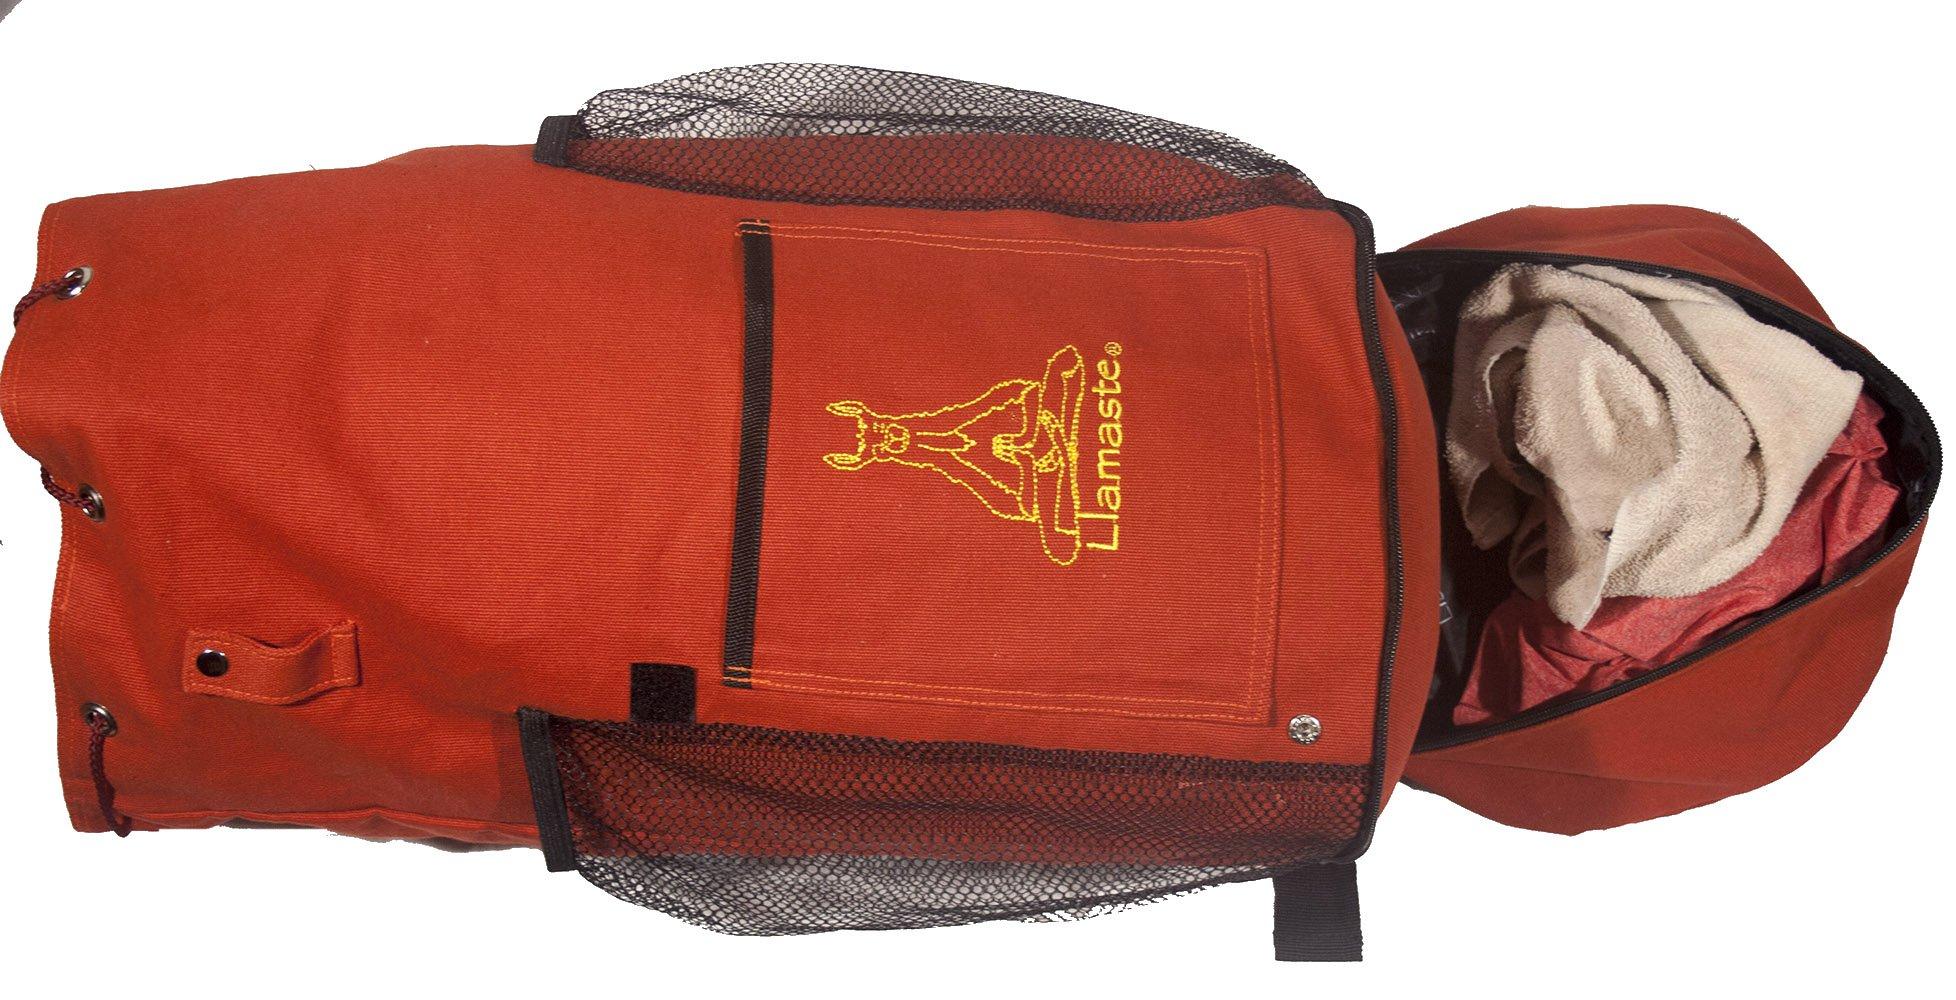 Llamaste Premium Edition Yoga Mat Duffle Bag by Llamaste (Image #3)